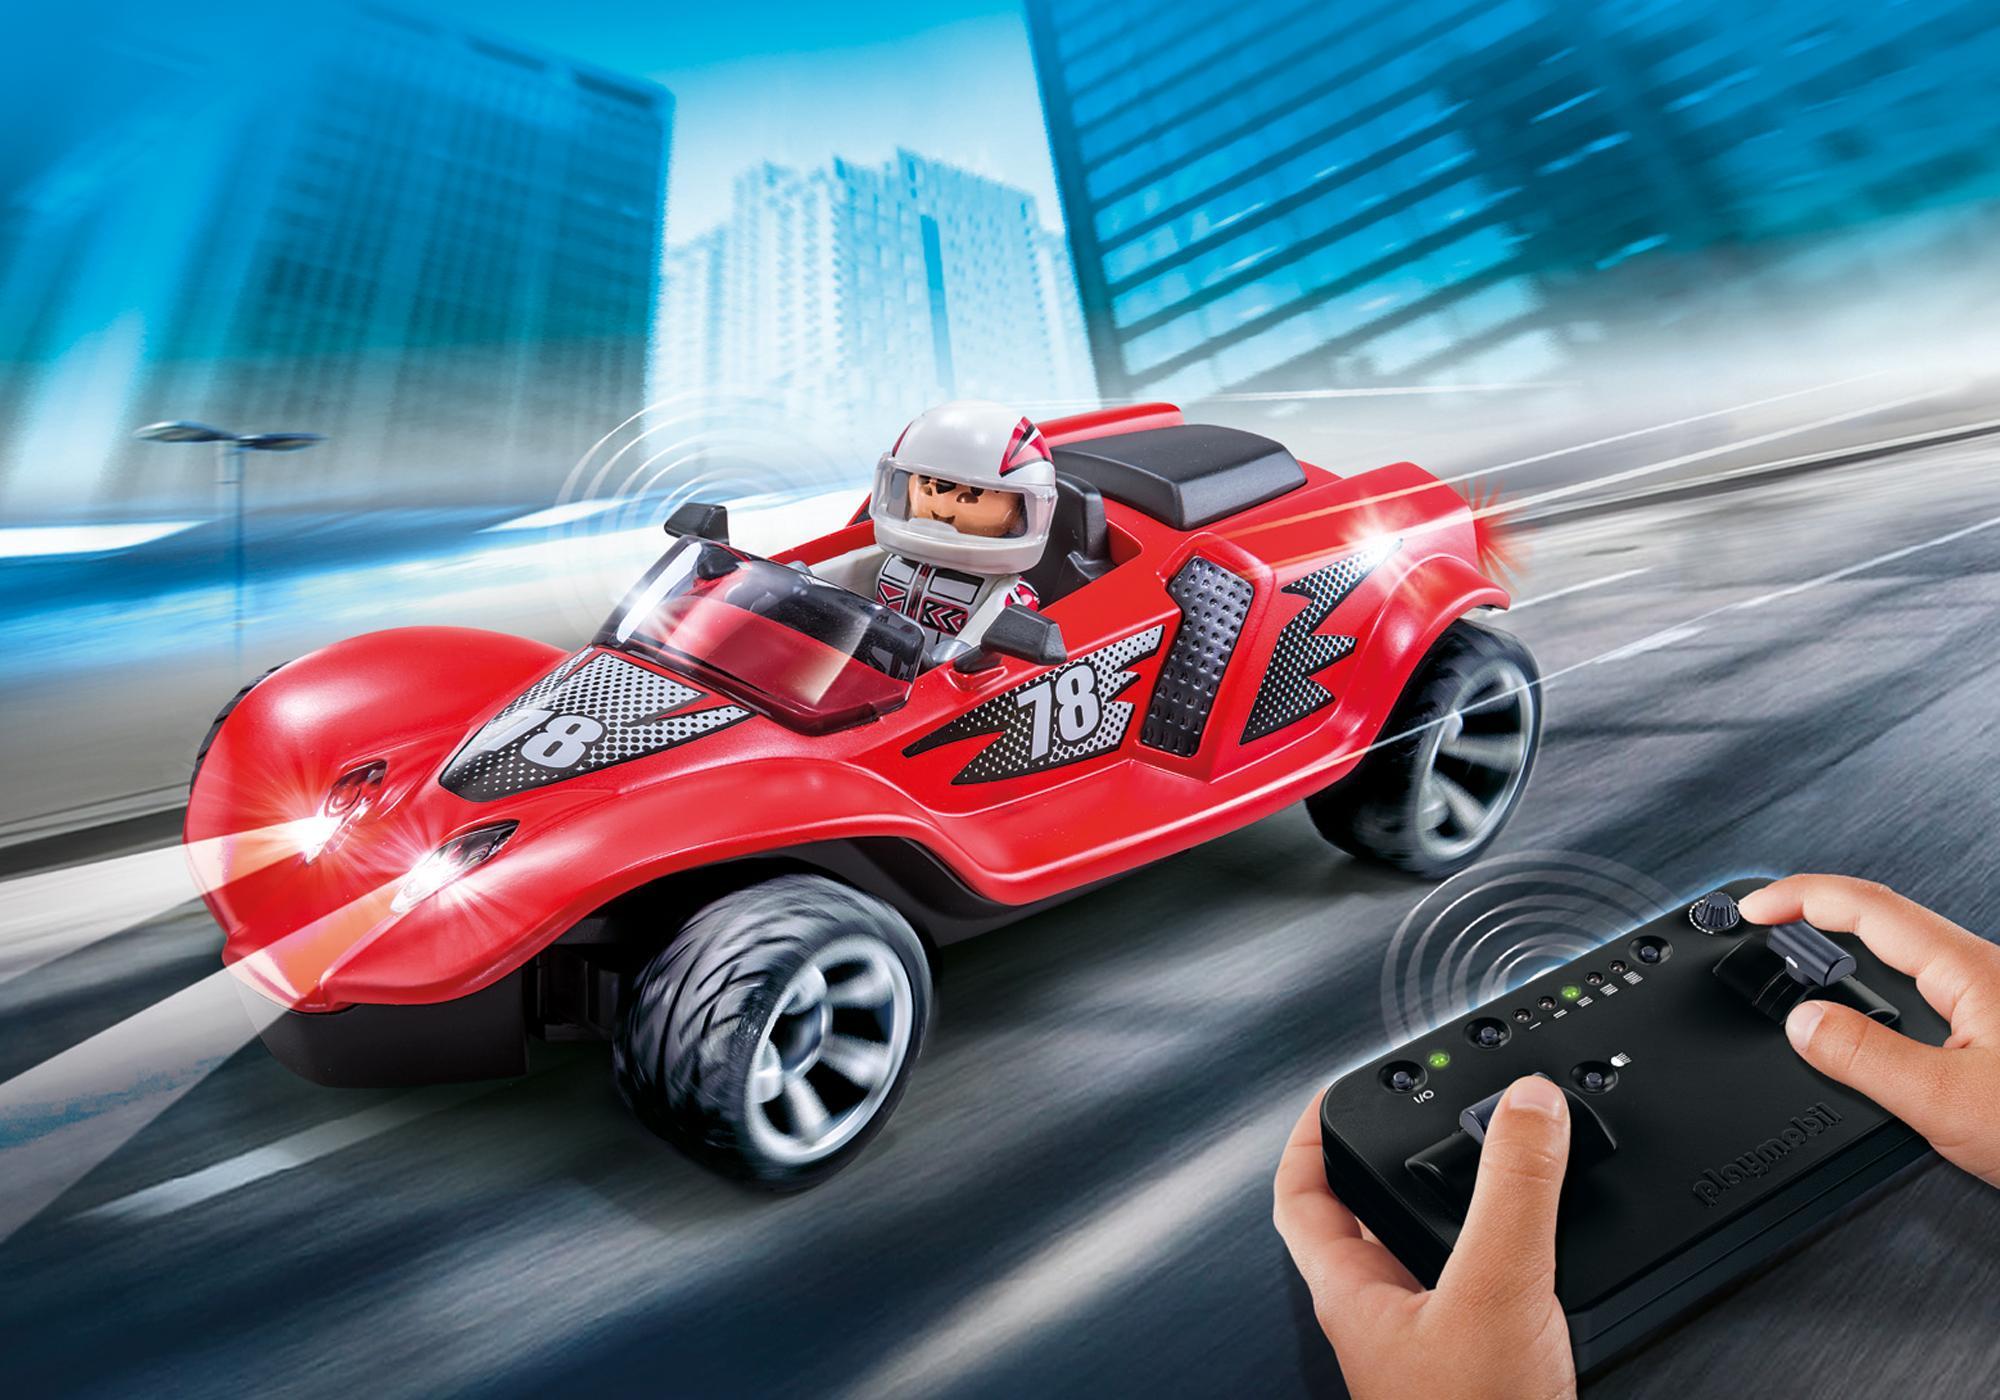 http://media.playmobil.com/i/playmobil/9090_product_detail/Racer Rocket RC